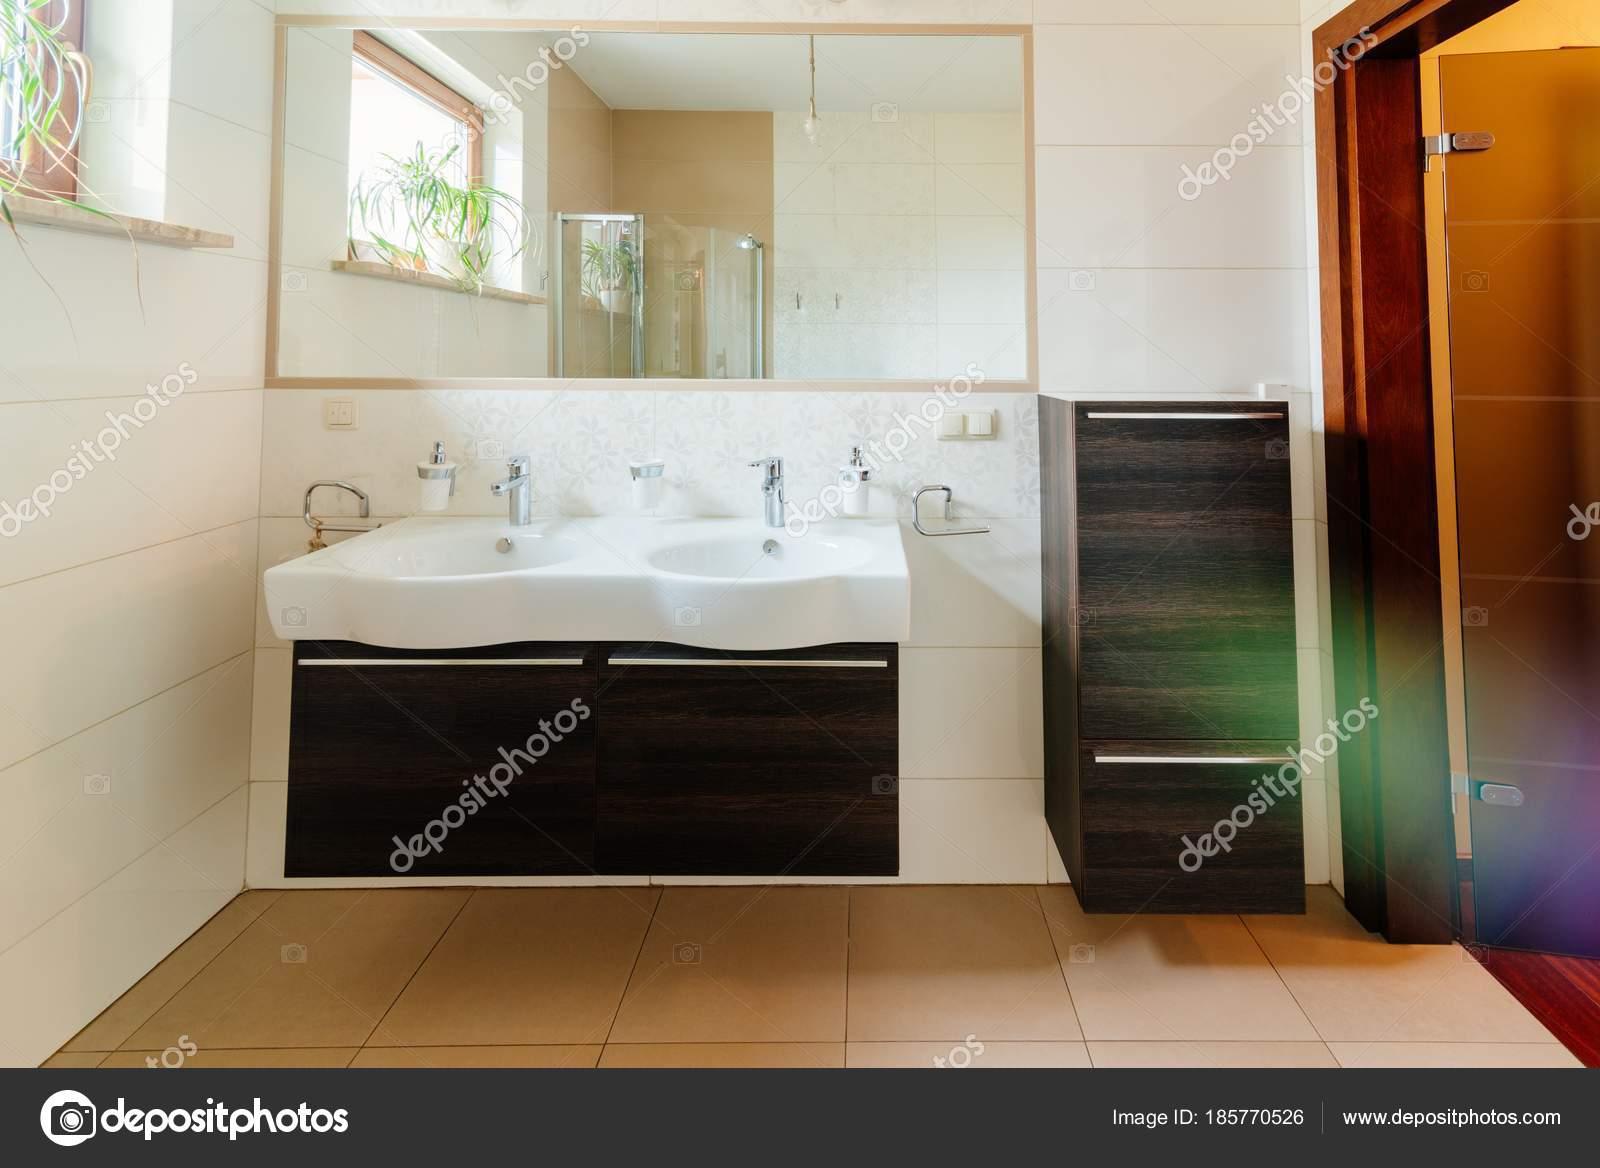 Moderne badkamer met dubbele wastafel — Stockfoto © djedzura #185770526